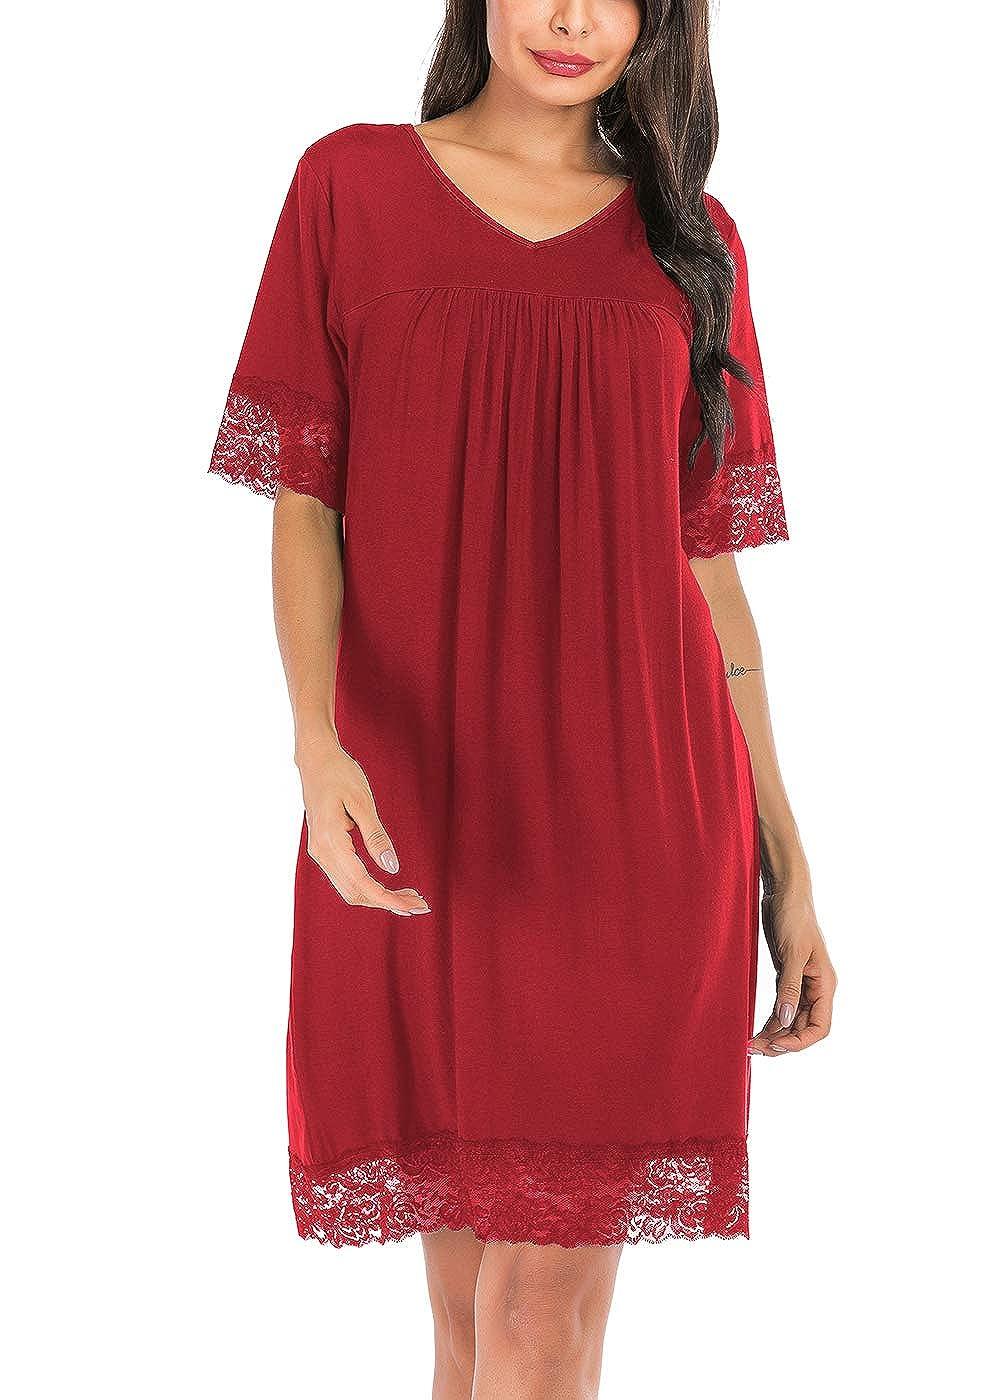 ABirdon Womens Cotton Nightdress Lace Trim V-Neck Nightwear Short Sleeve Nightshirt Sleepwear